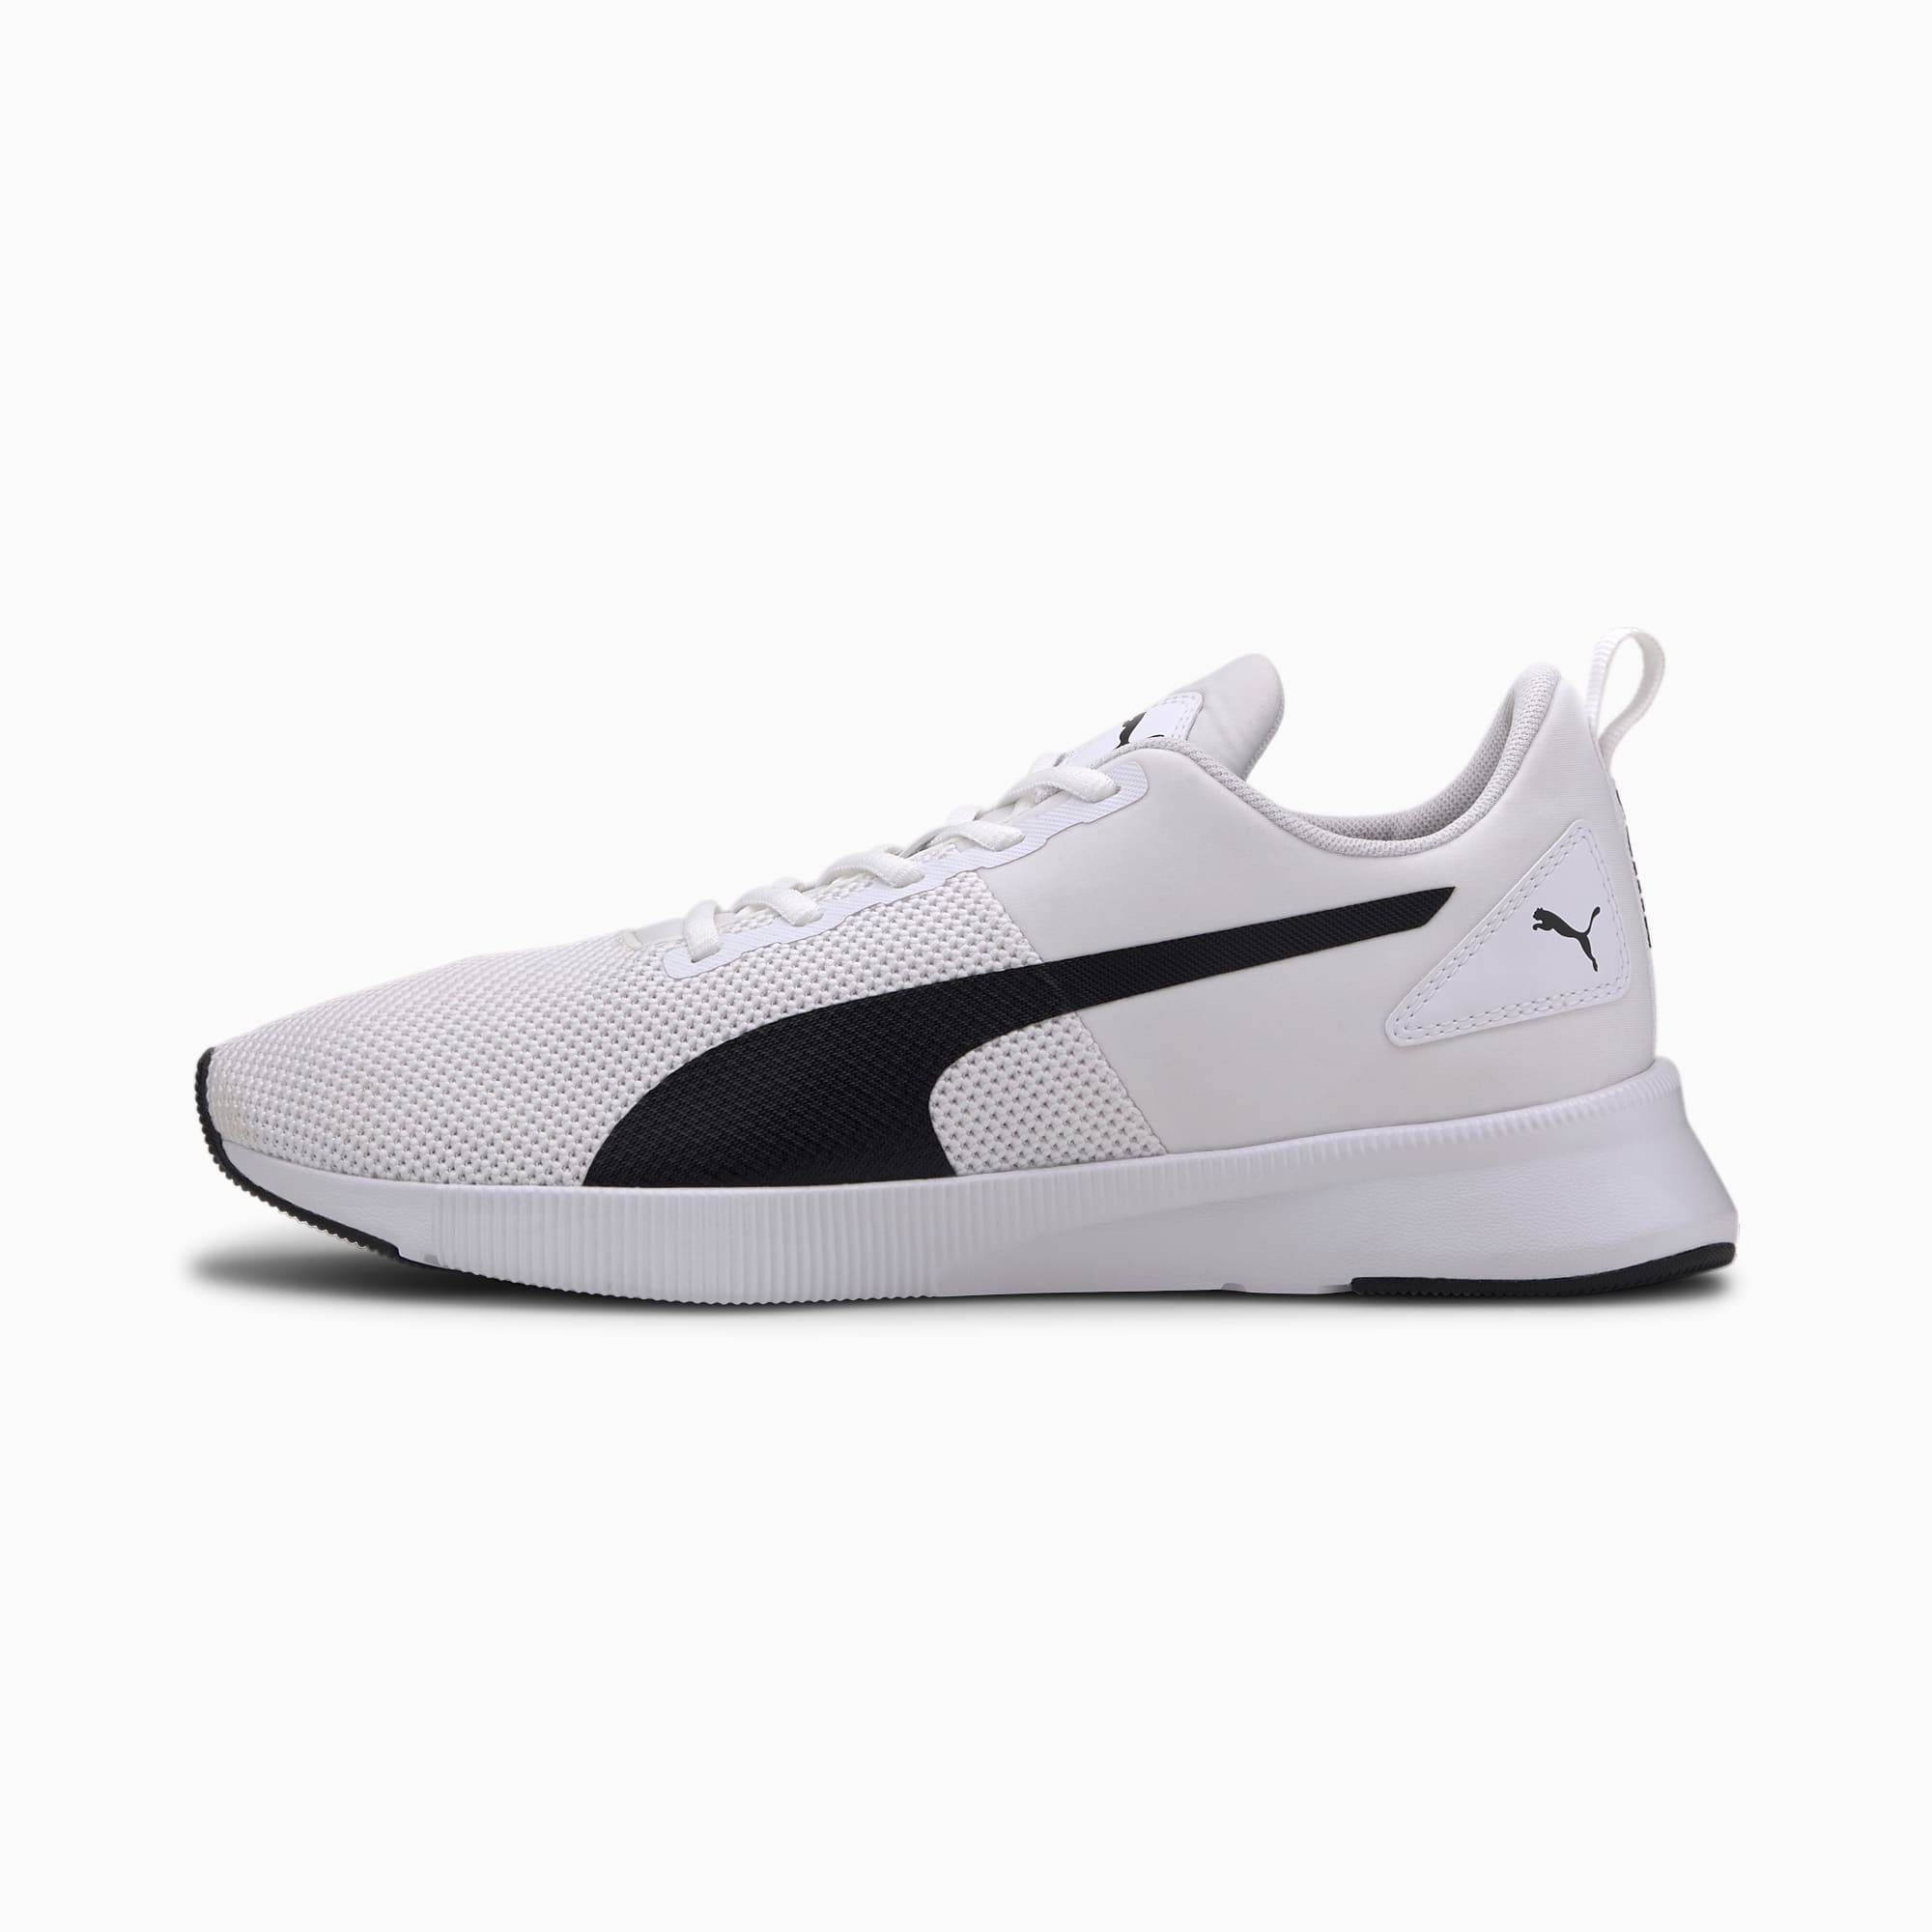 PUMA Chaussure de course Flyer Runner, Blanc/Noir, Taille 45, Chaussures